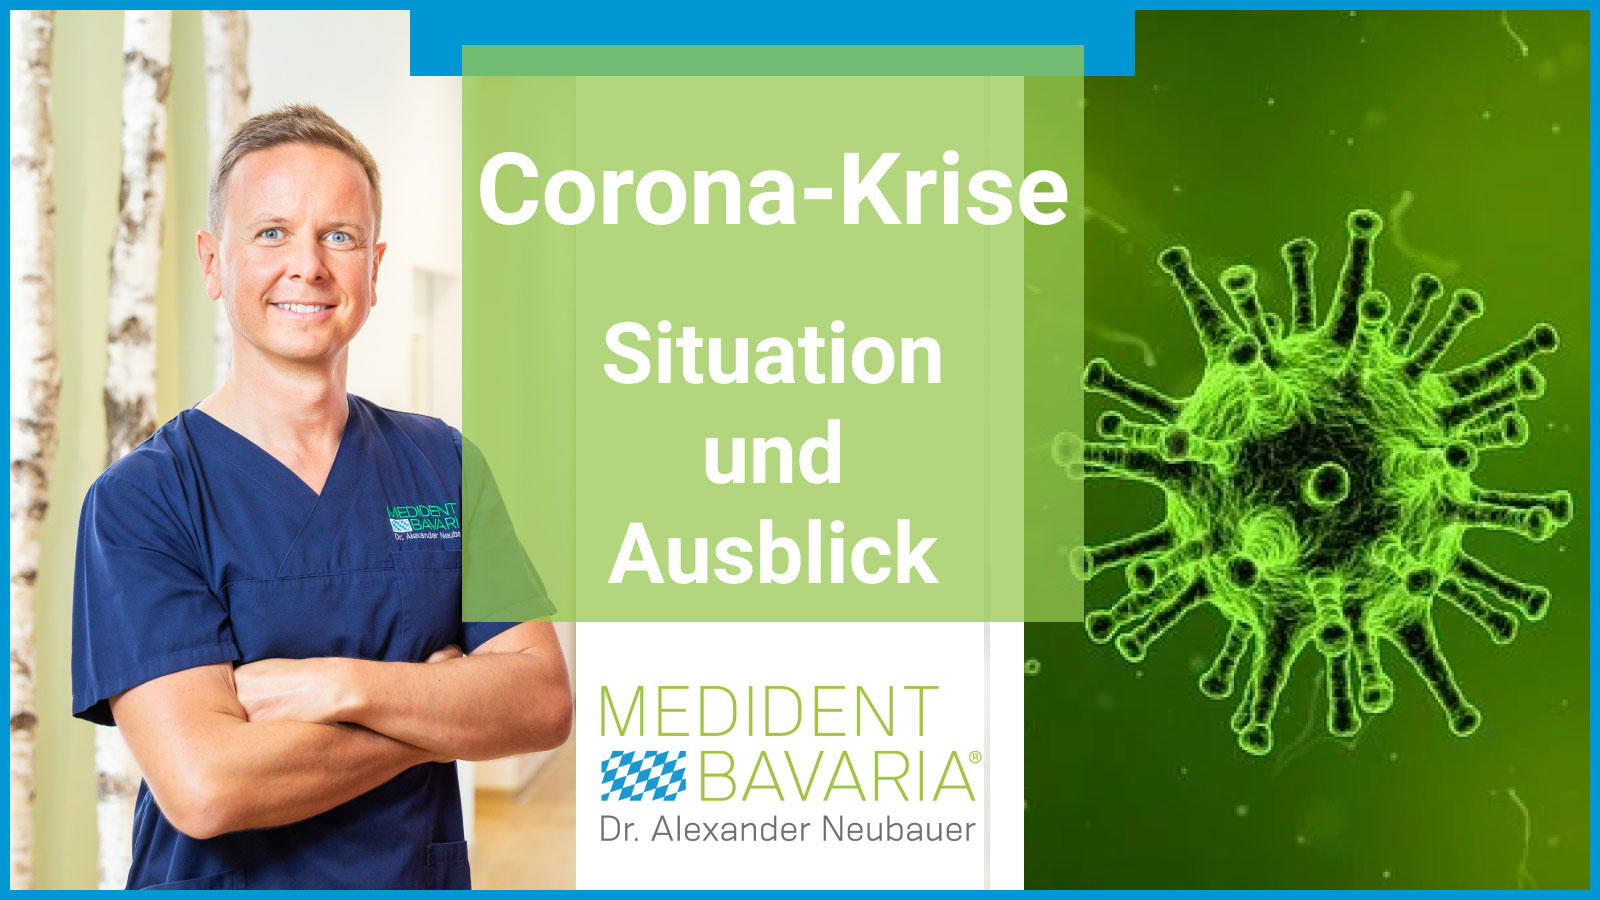 Sonderfolge: Corona Krise - aktueller Situationsbericht und Ausblick!